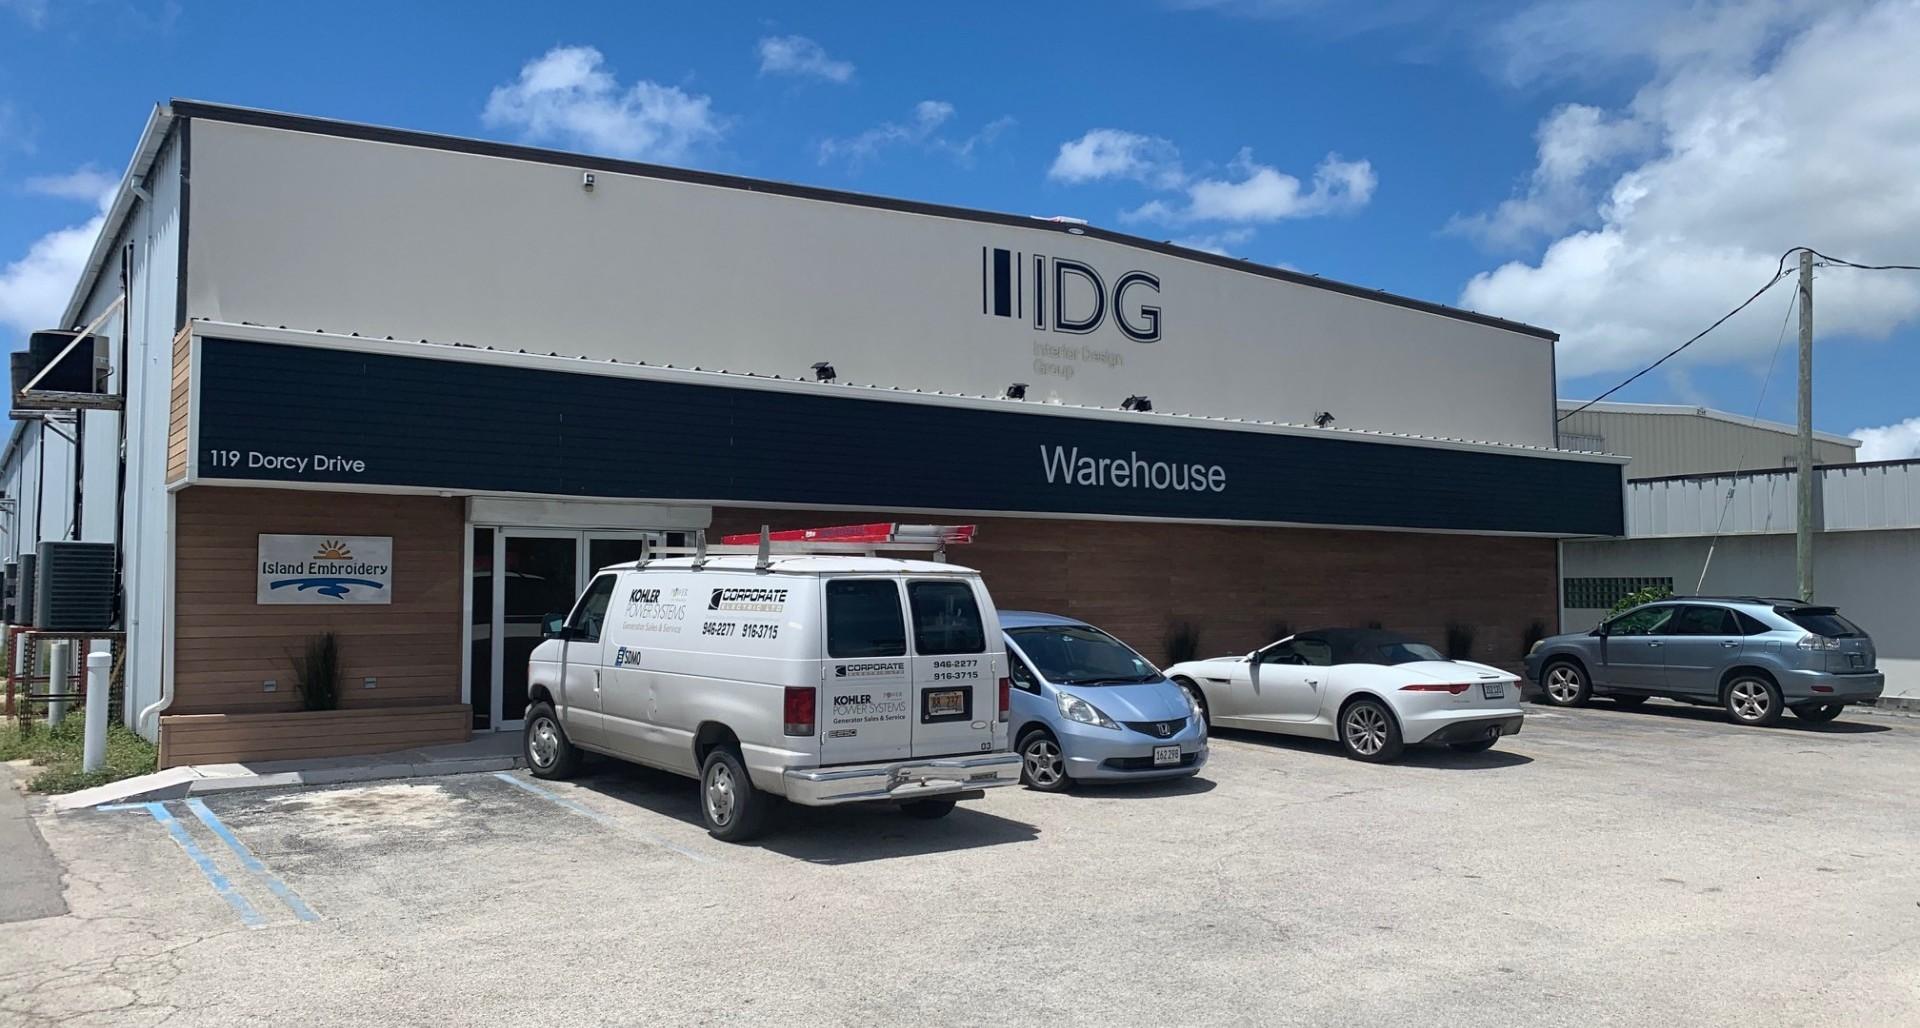 IDG Warehouse- shared